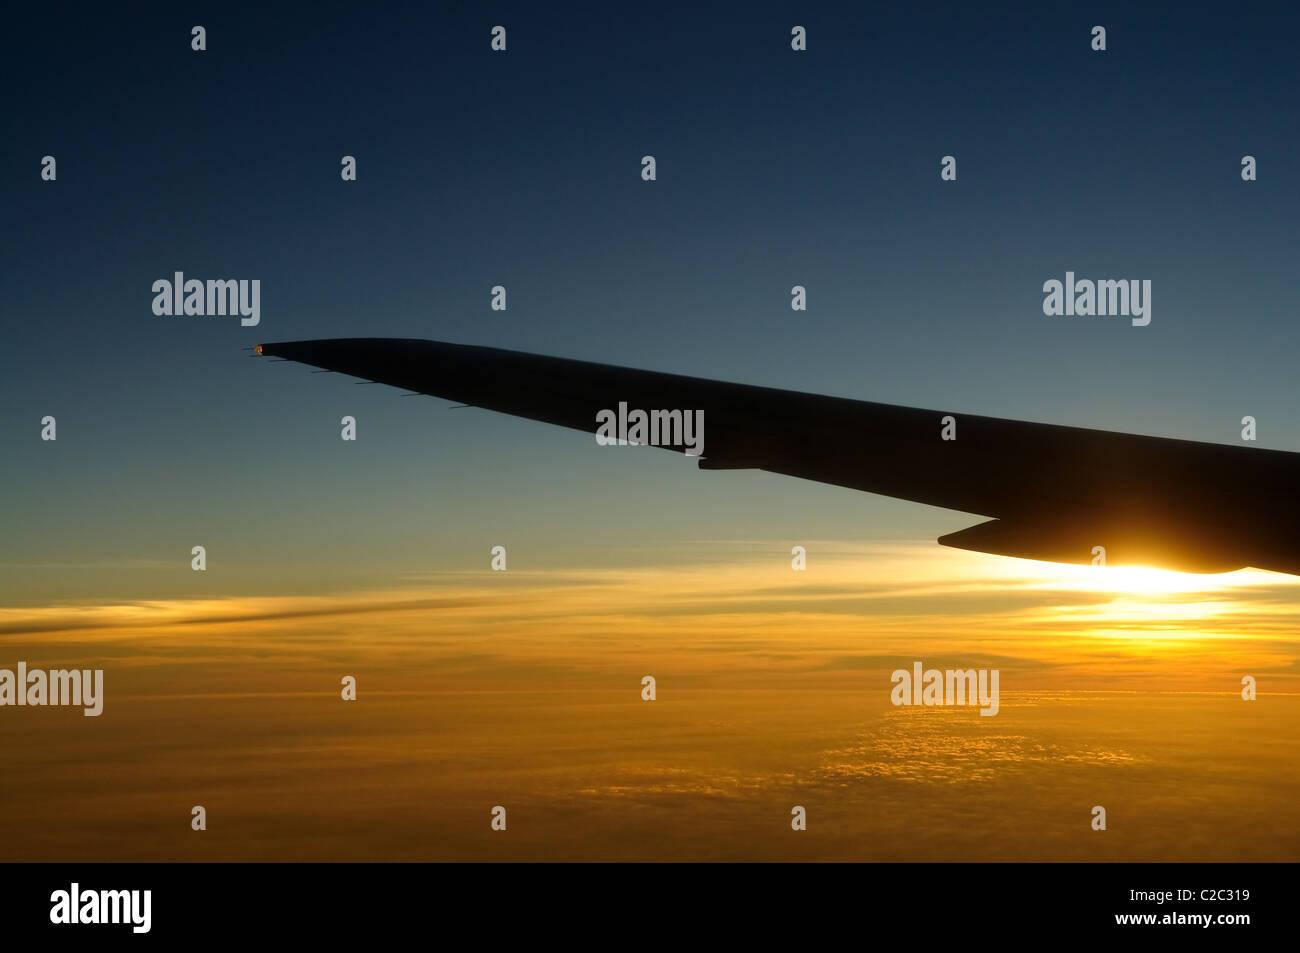 Sunset under airplane wing skyline - Stock Image